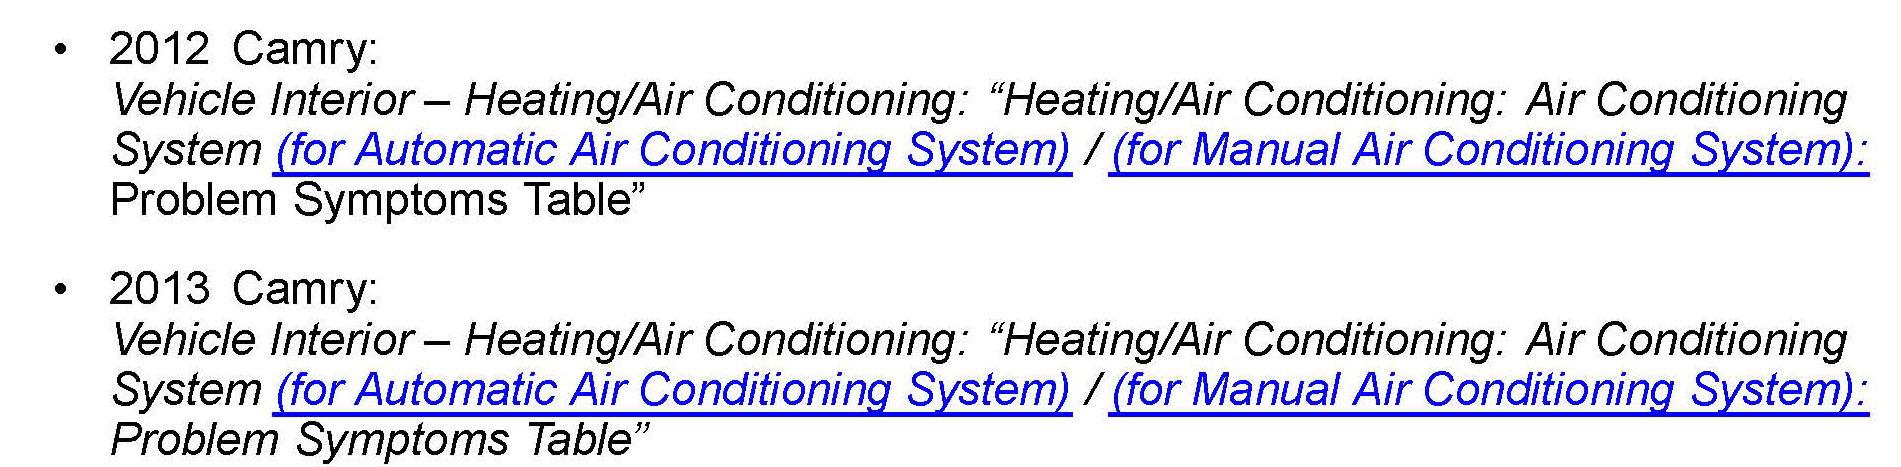 Toyota Sienna Service Manual: Problem symptoms table